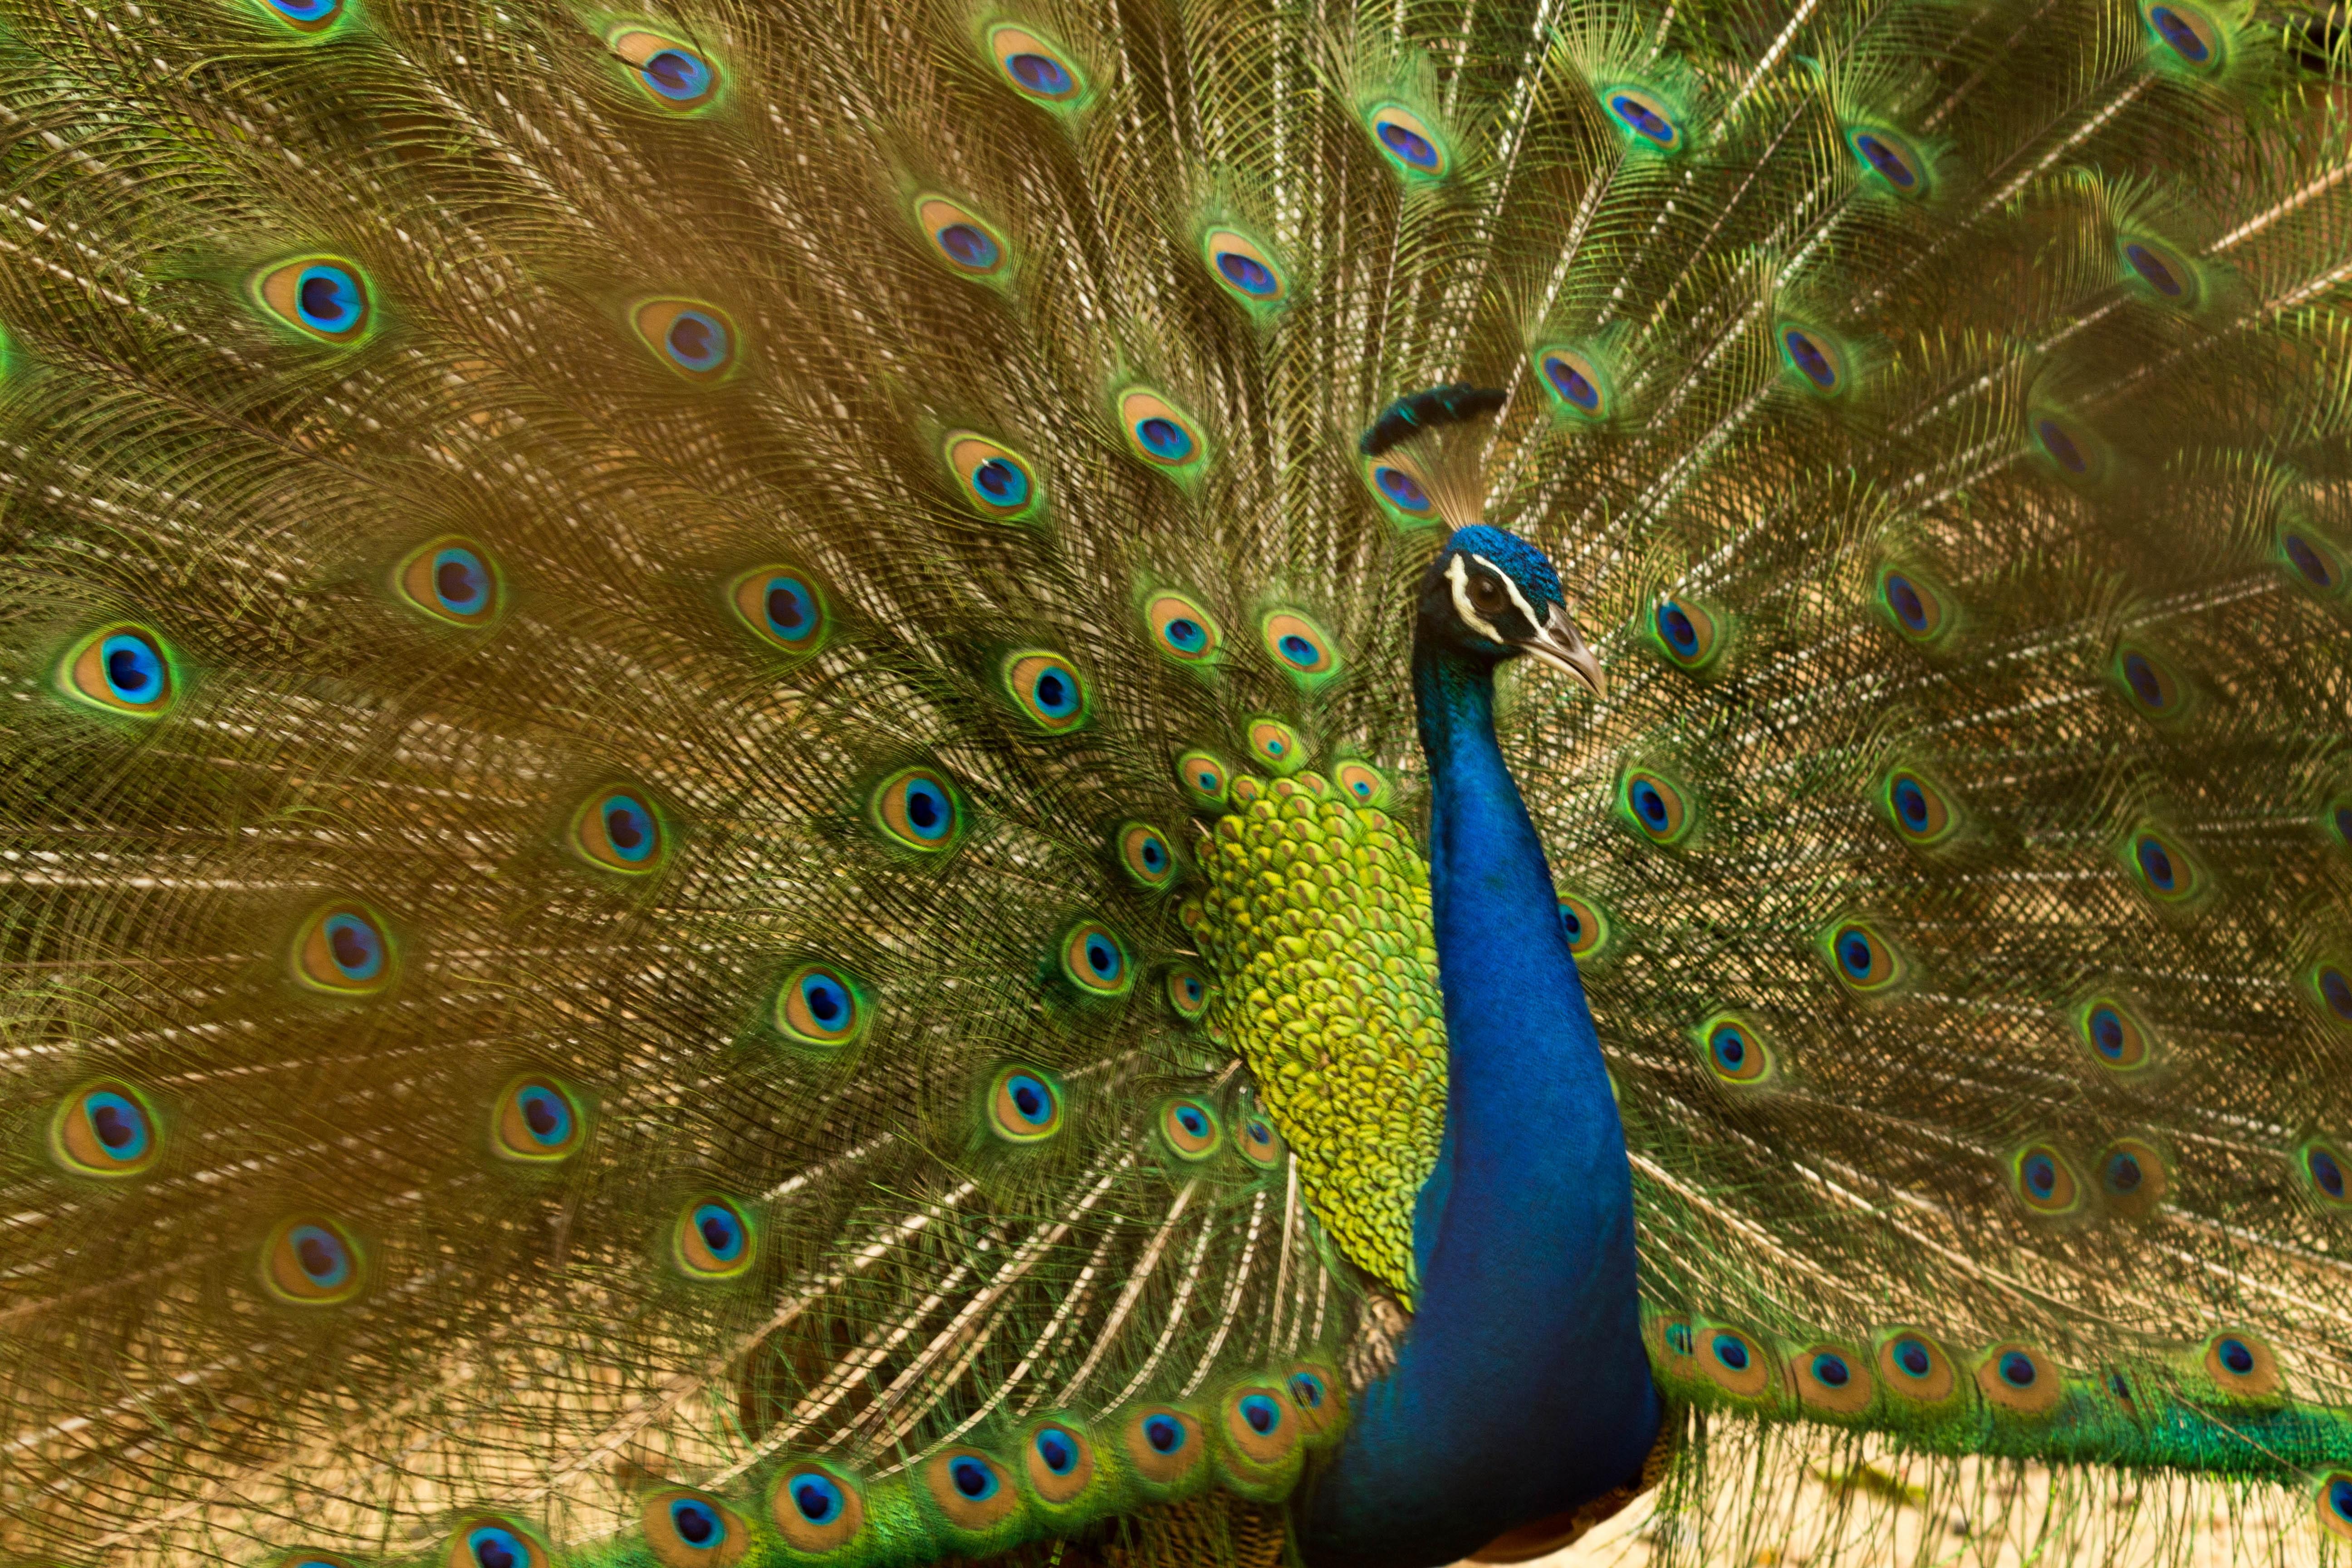 Iphone X Wallpaper Hd 4k Blue Peacock 183 Free Stock Photo